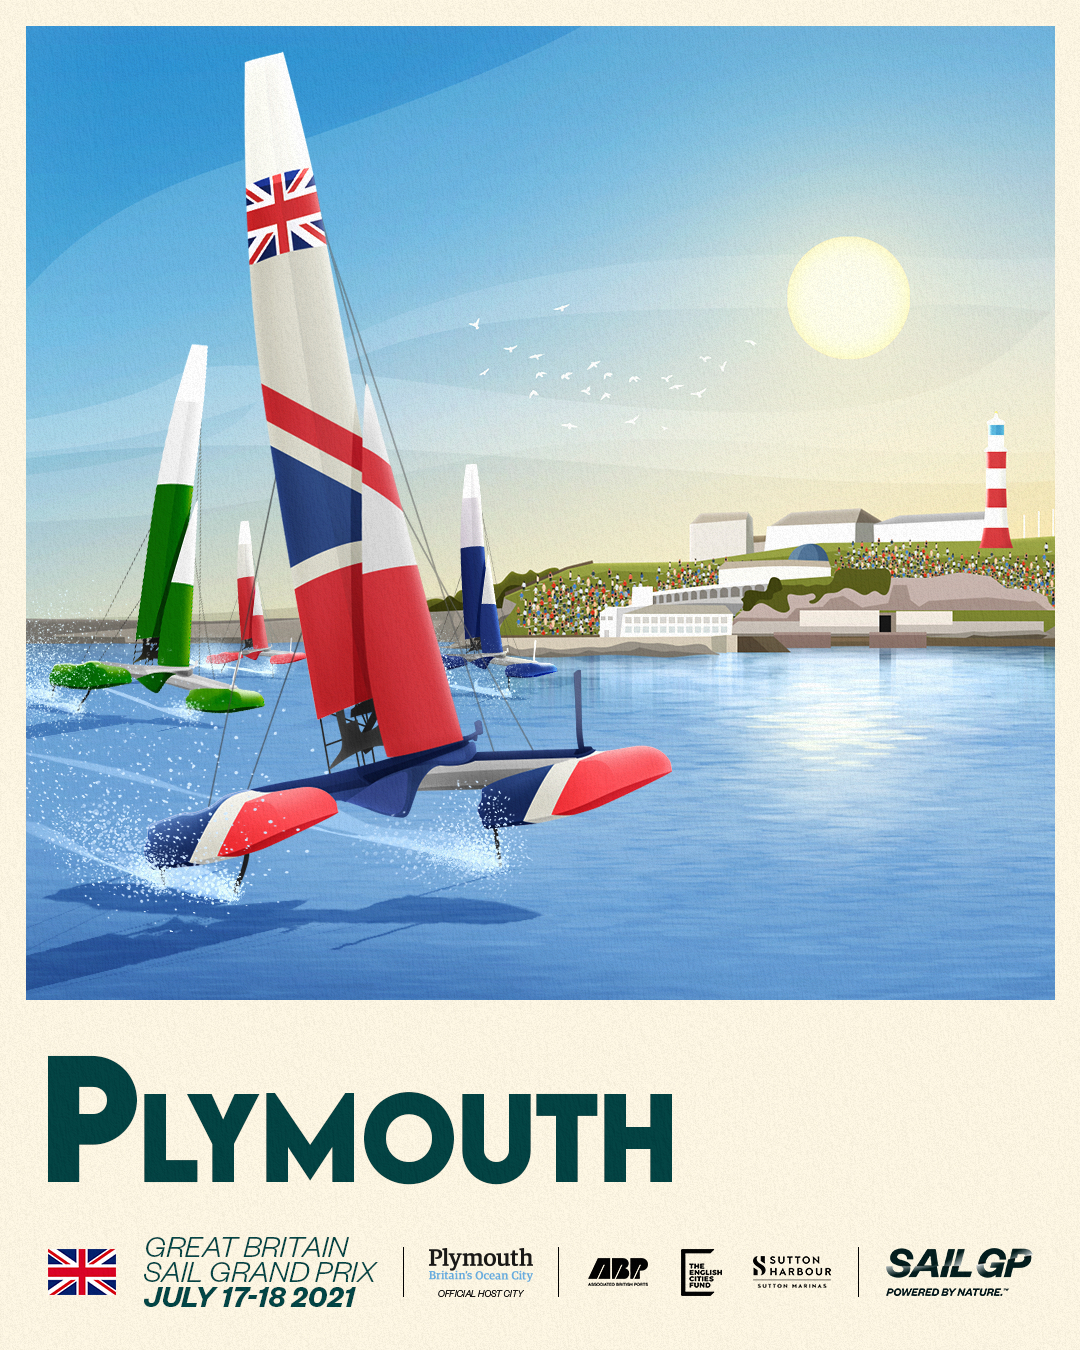 Sail GP Great Britain Sail Grand Prix Plymouth event poster